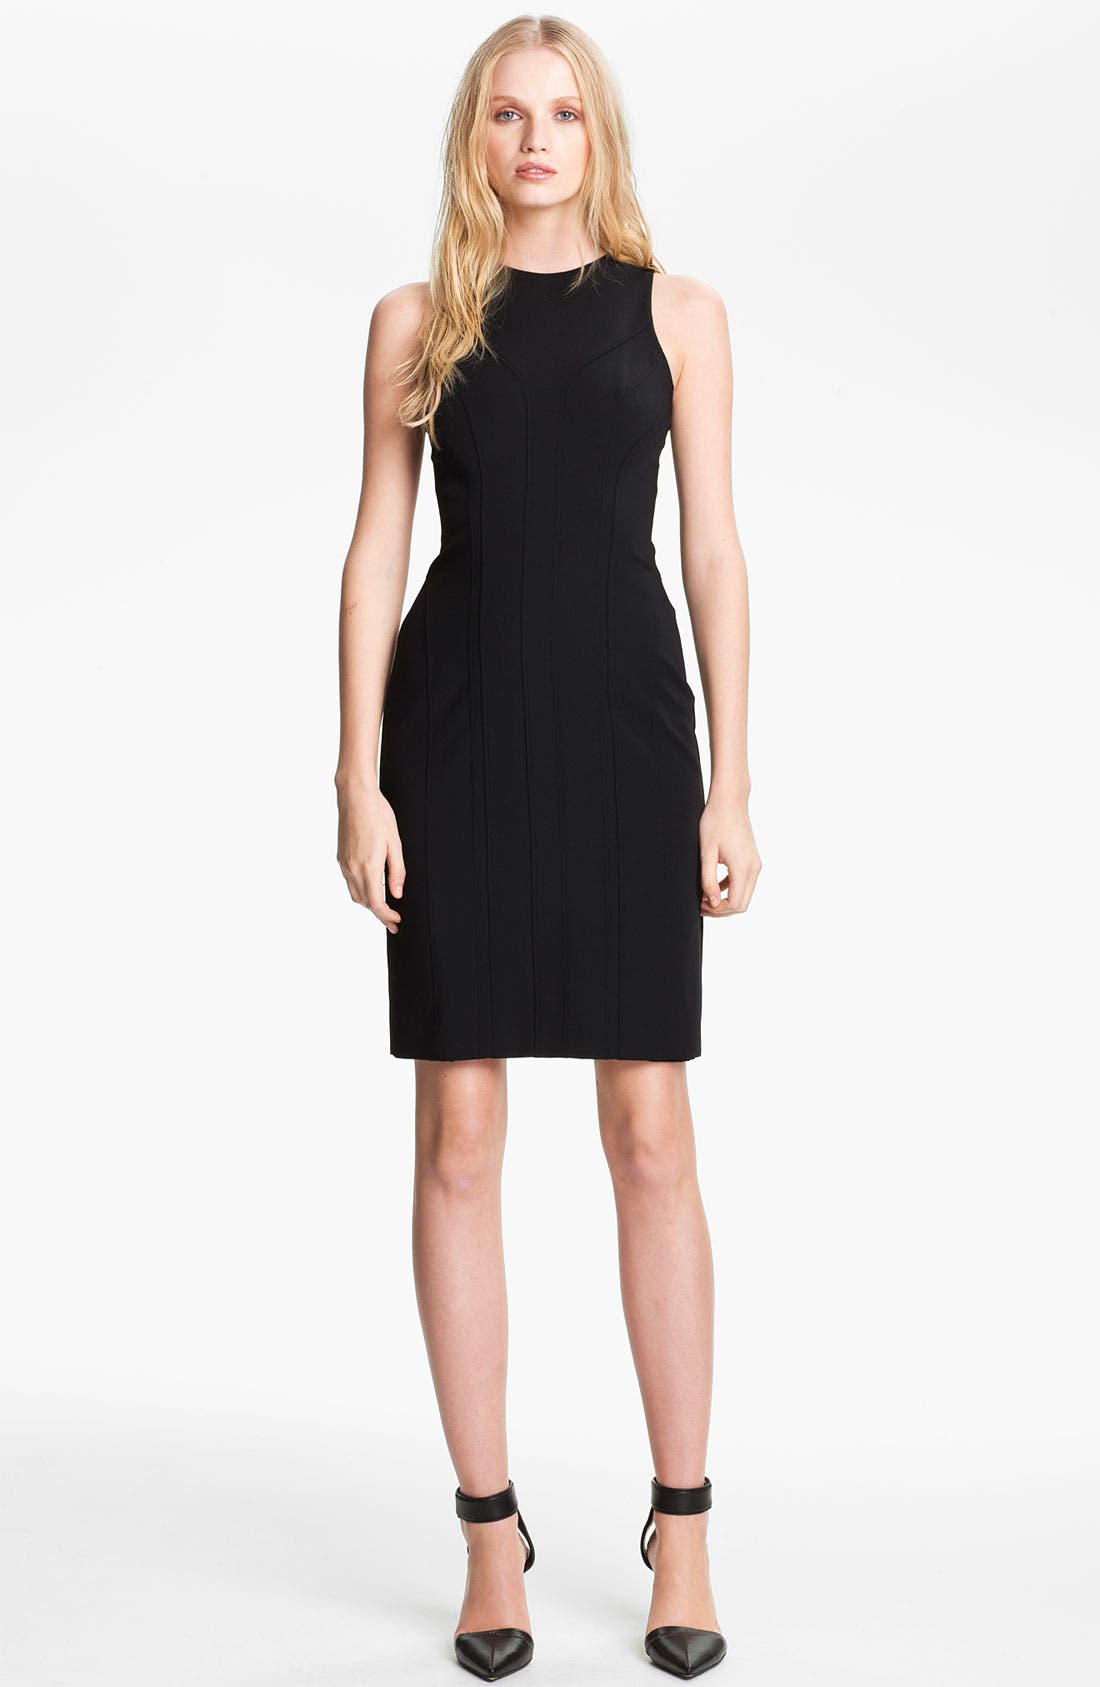 Alternate Image 1 Selected - Alexander Wang Sleeveless Fitted Dress